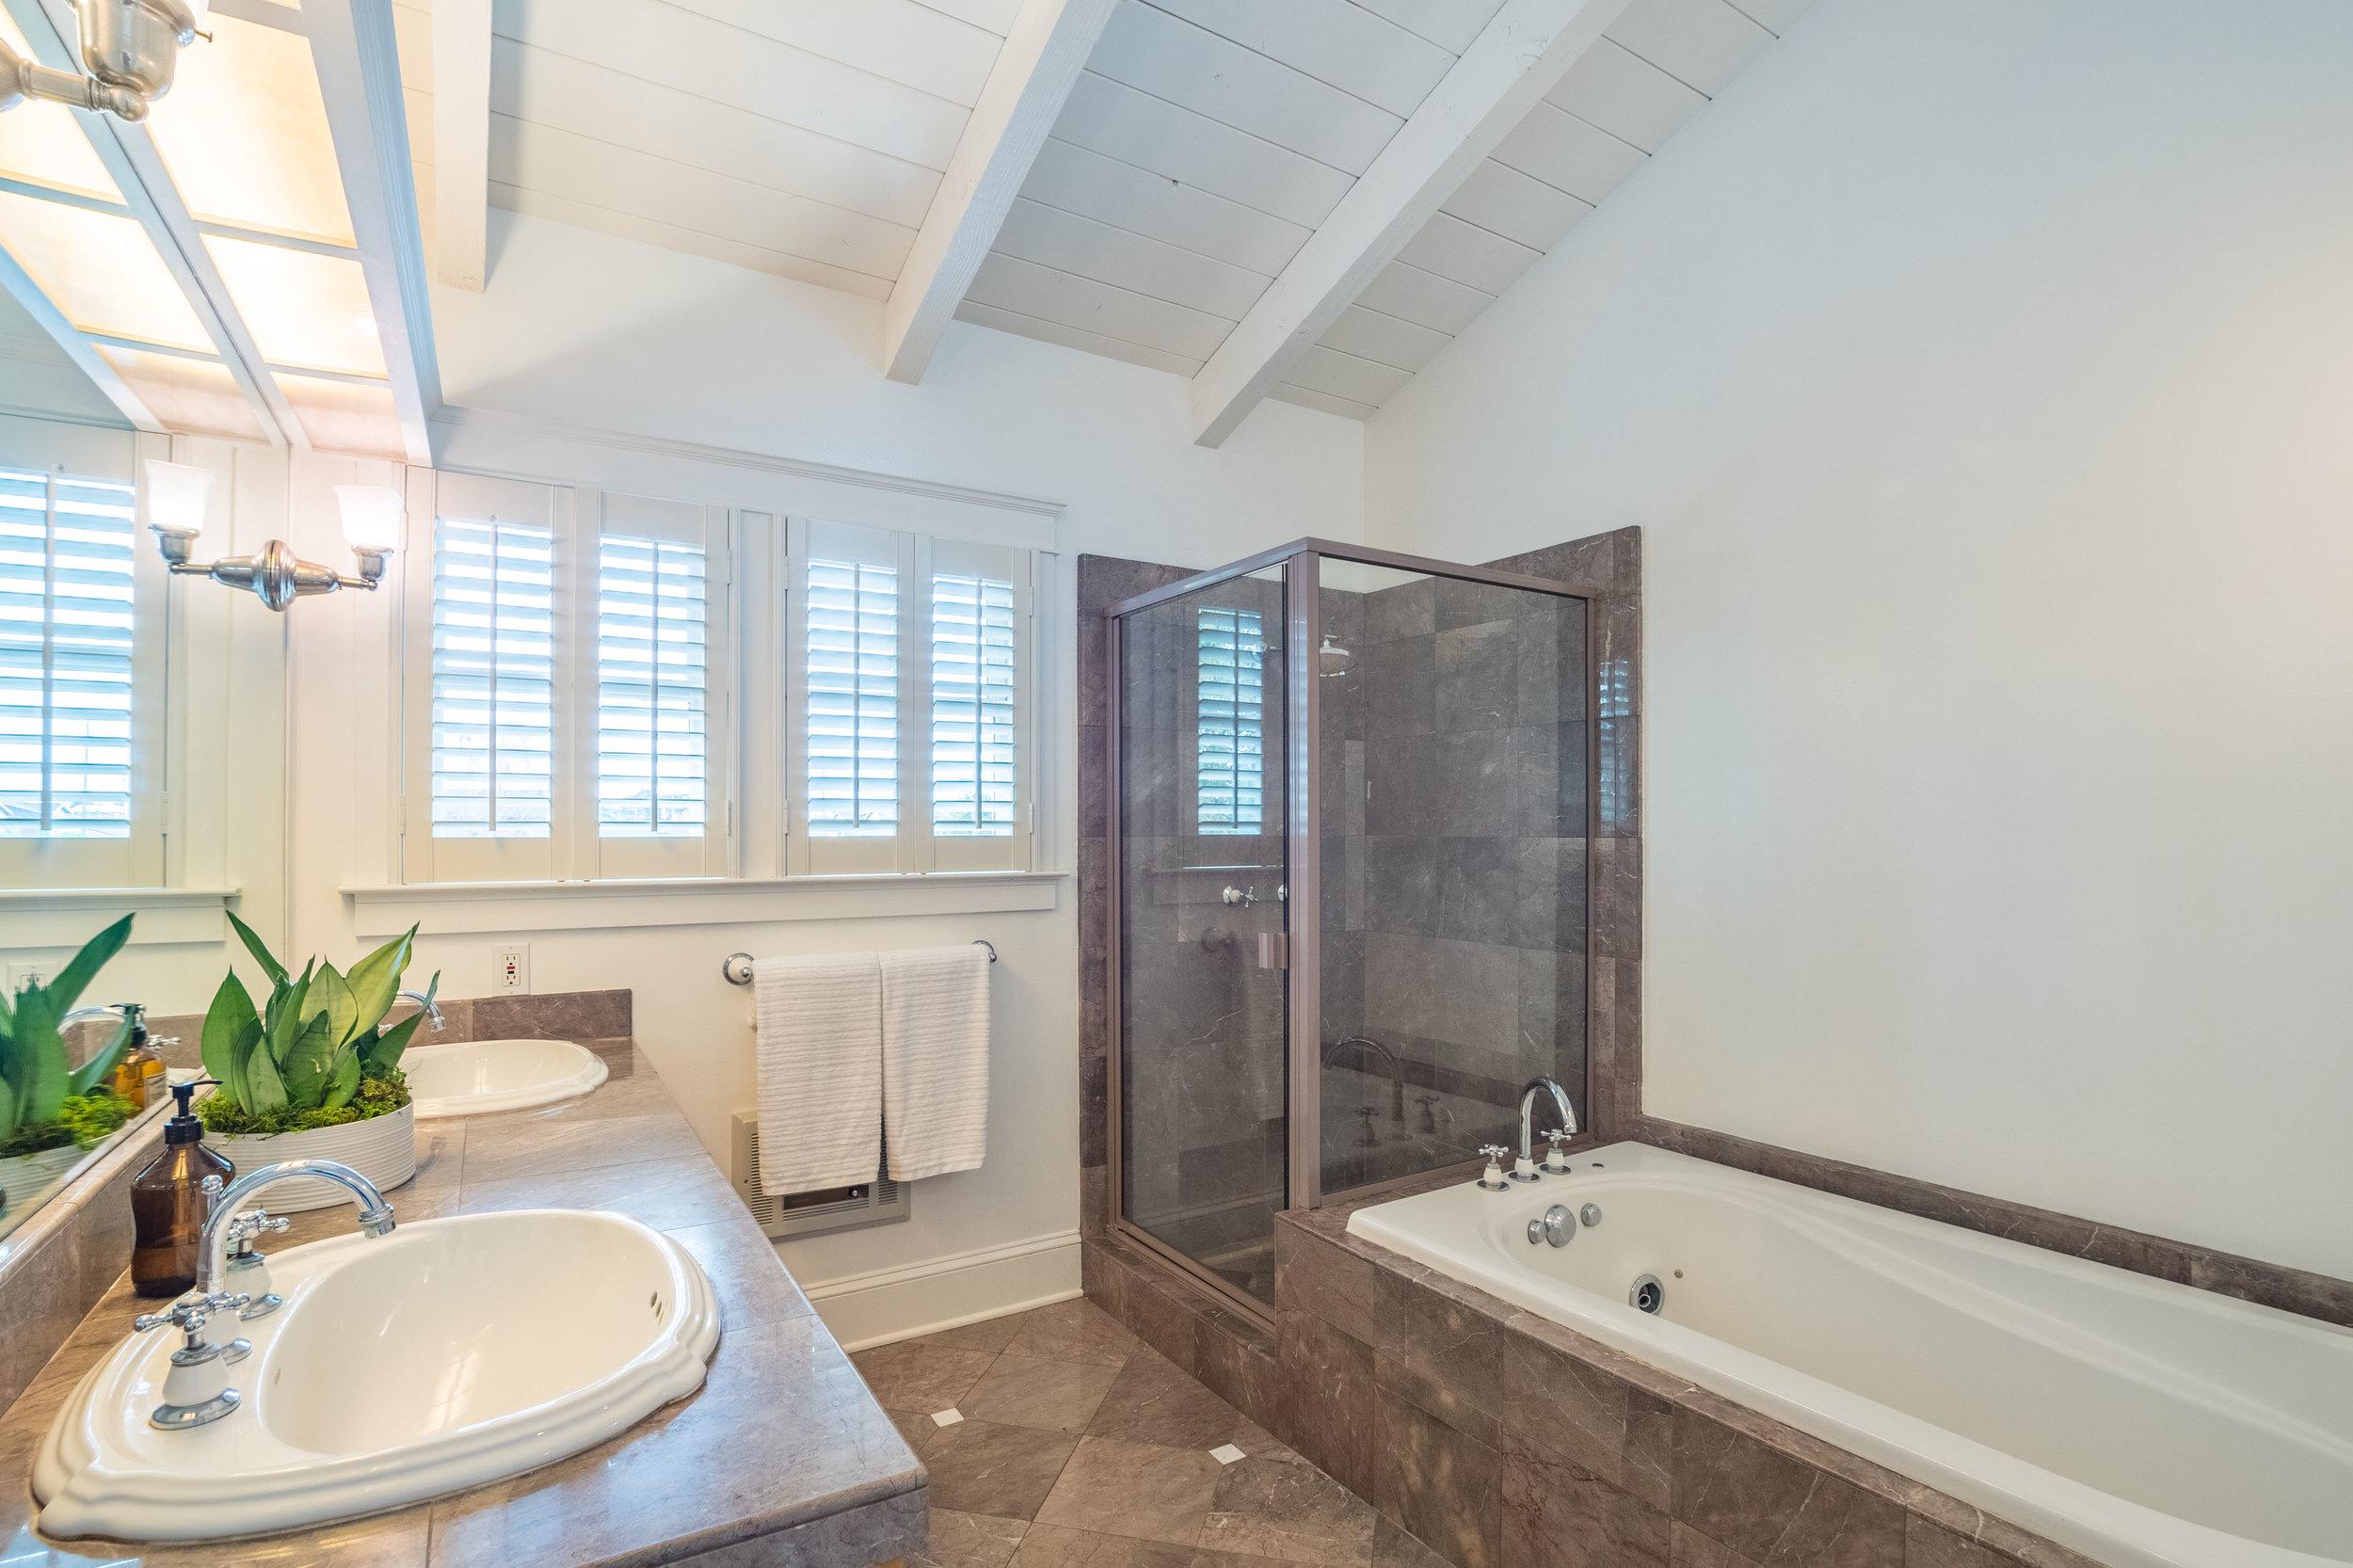 Large Updated Bathroom in 3 Bedroom House